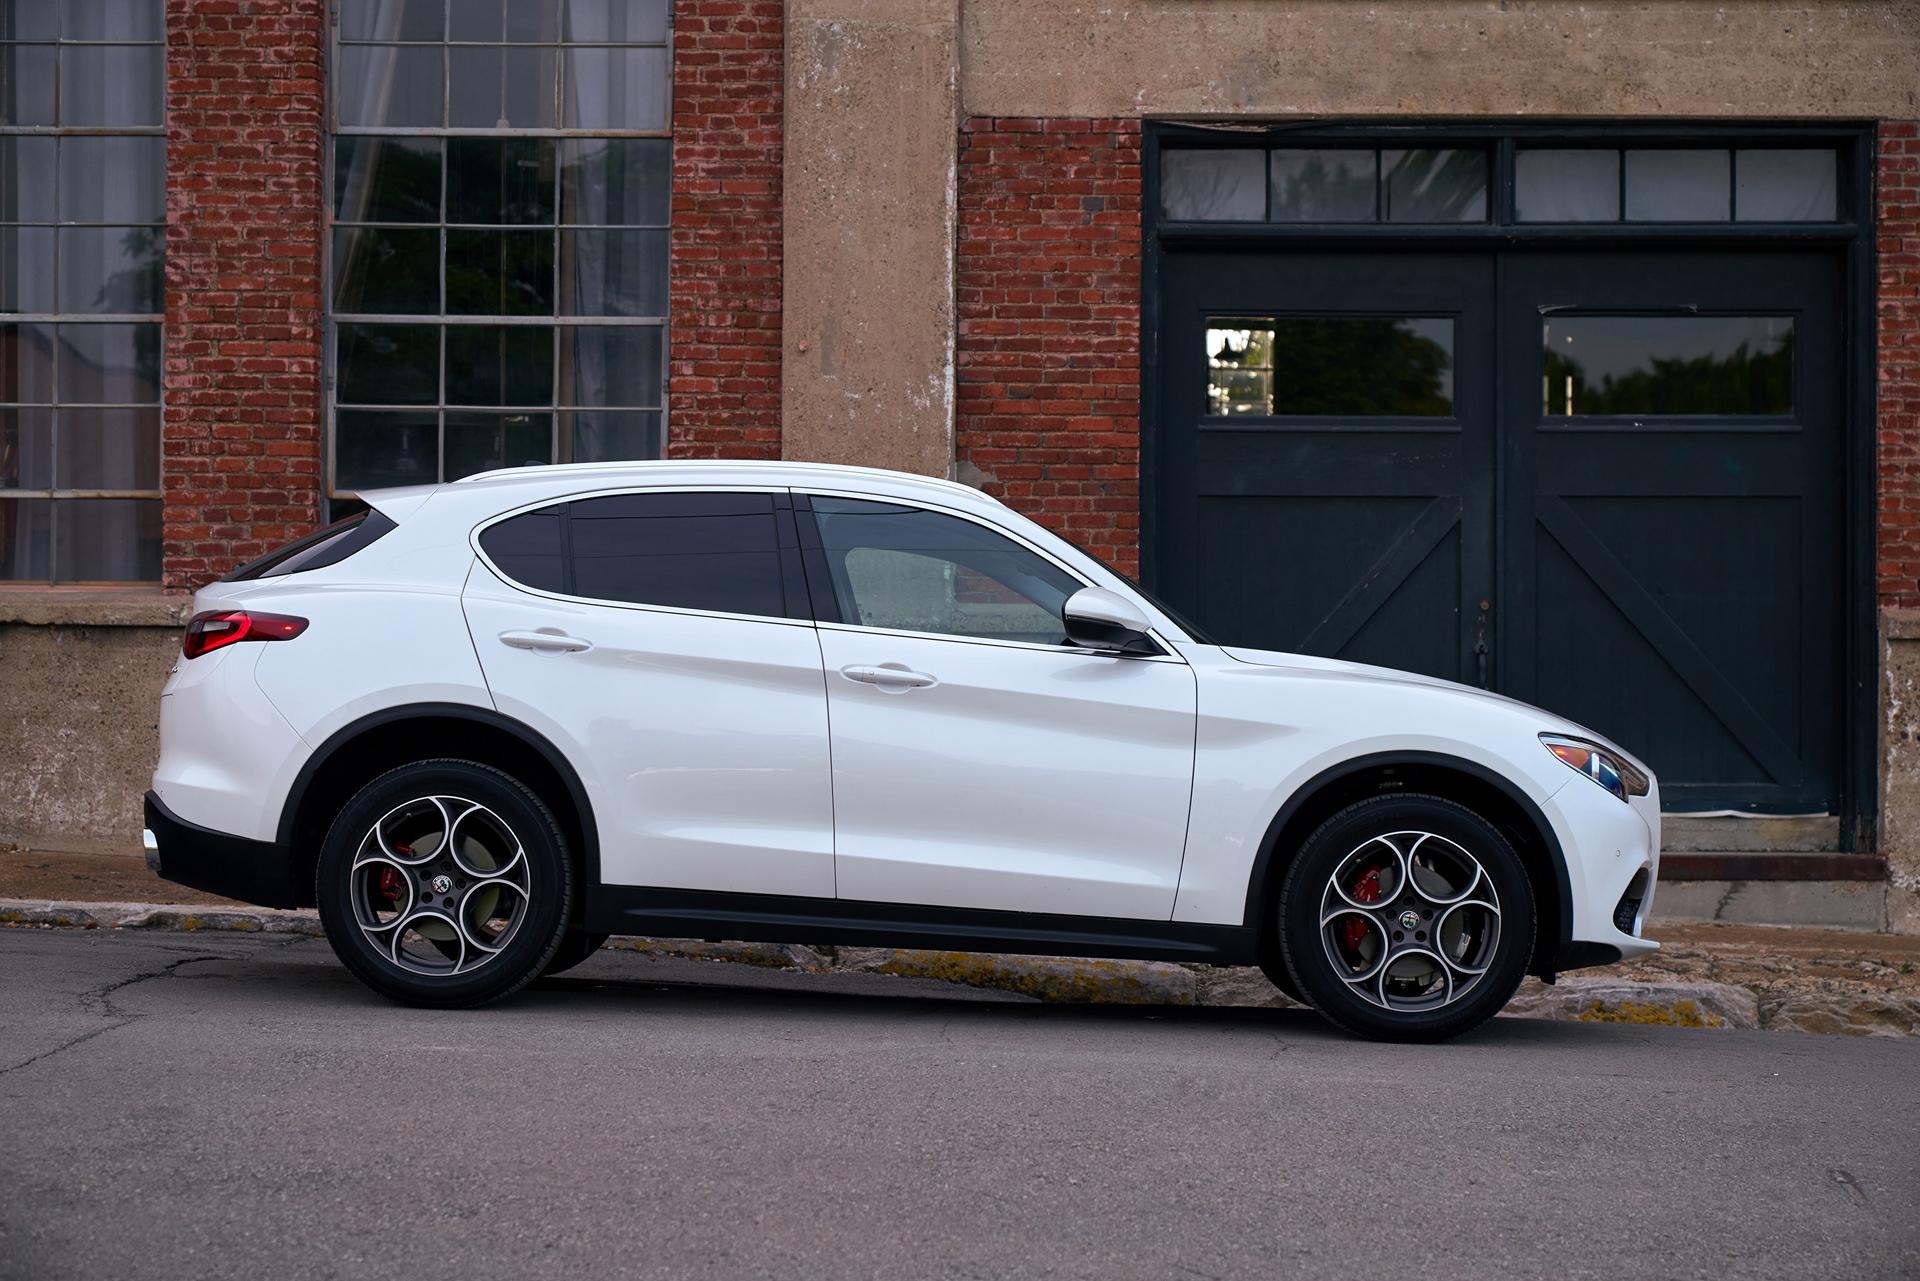 Alfa Romeo Stelvio Review Audi A6 Spy Shots Mercedes Amg